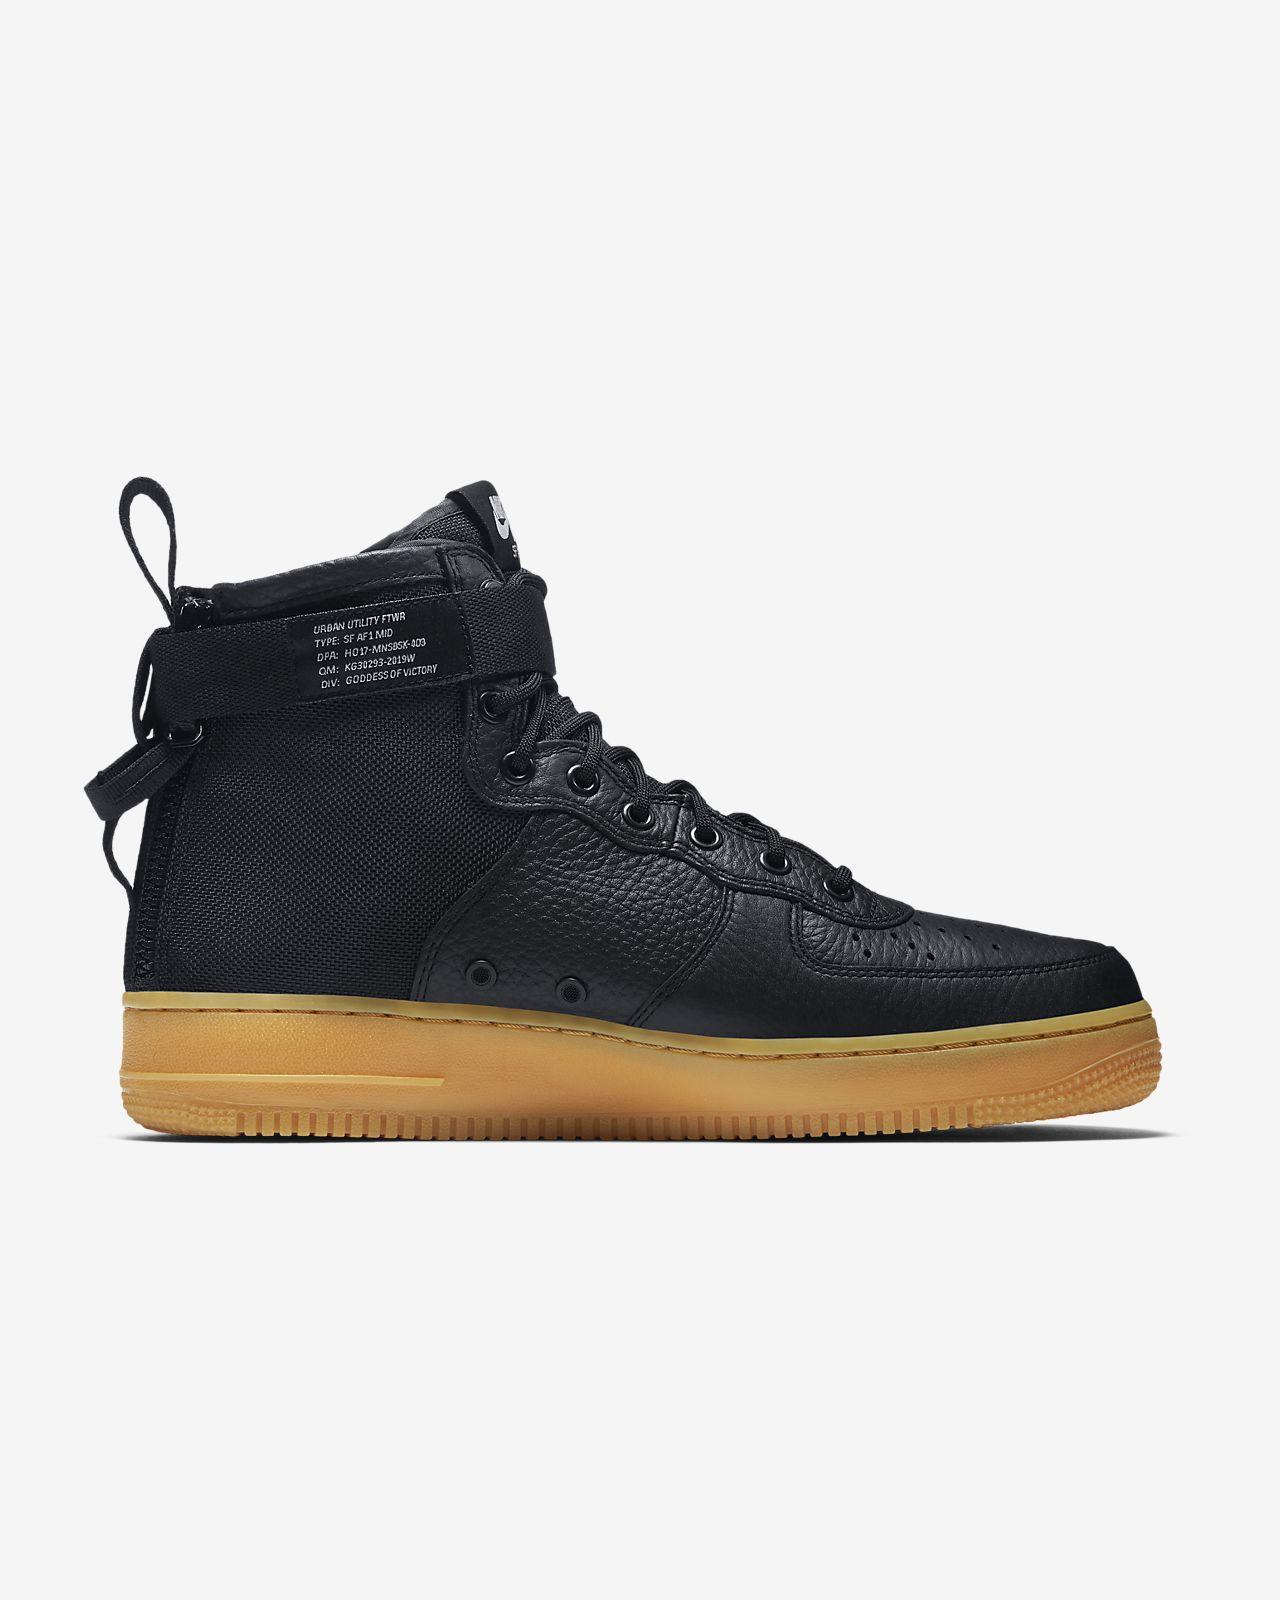 Sf Nike Air Force One Chaussures Mid Noir b5rxJY1U